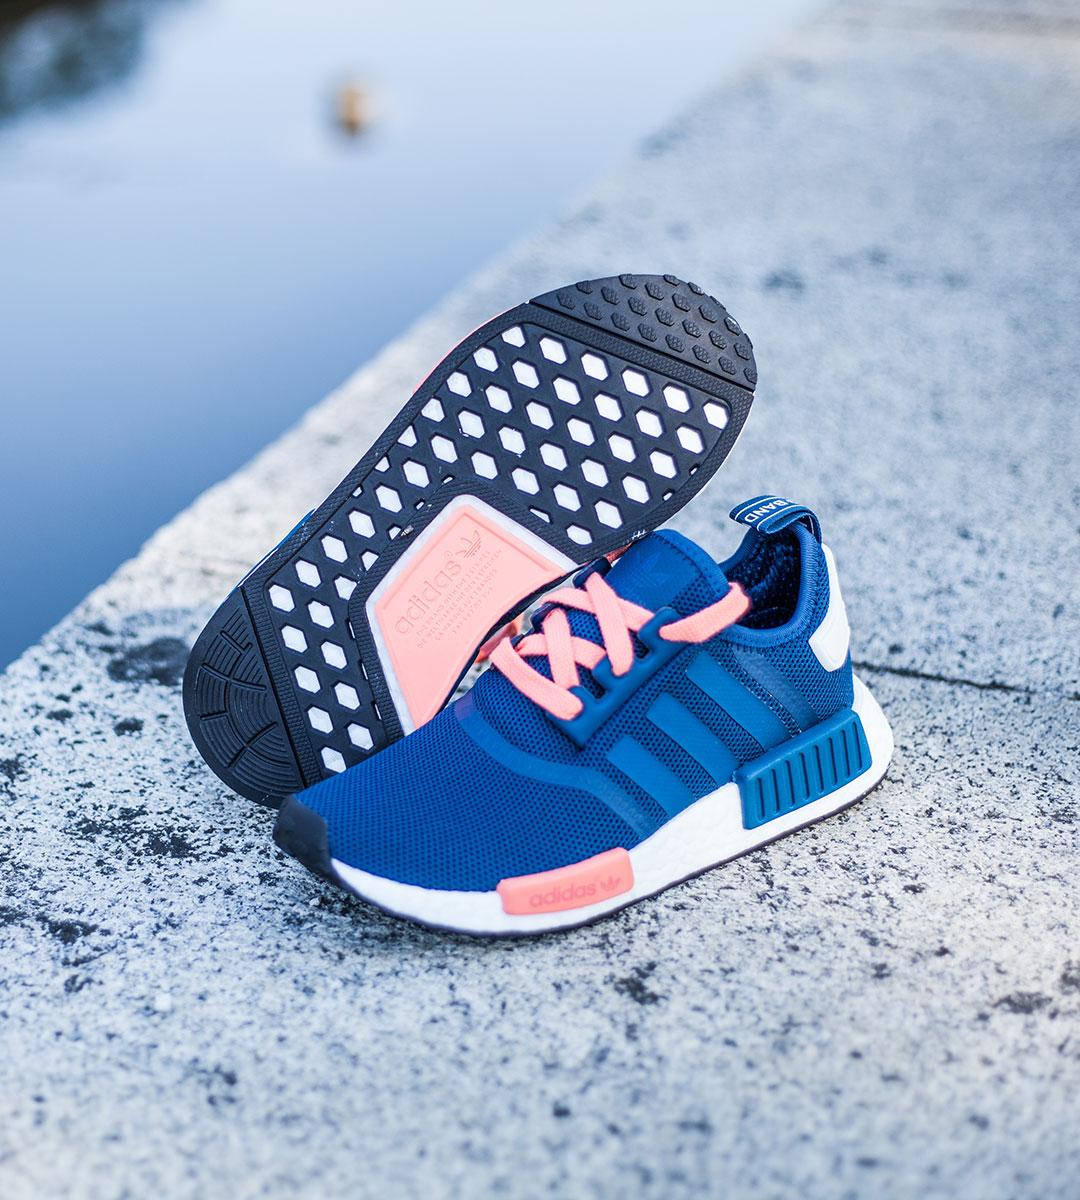 new concept 604a1 8cddf Adidas 阿迪达斯NMD Runner J 跑步鞋运动鞋- S75339 - 福建广电 ...